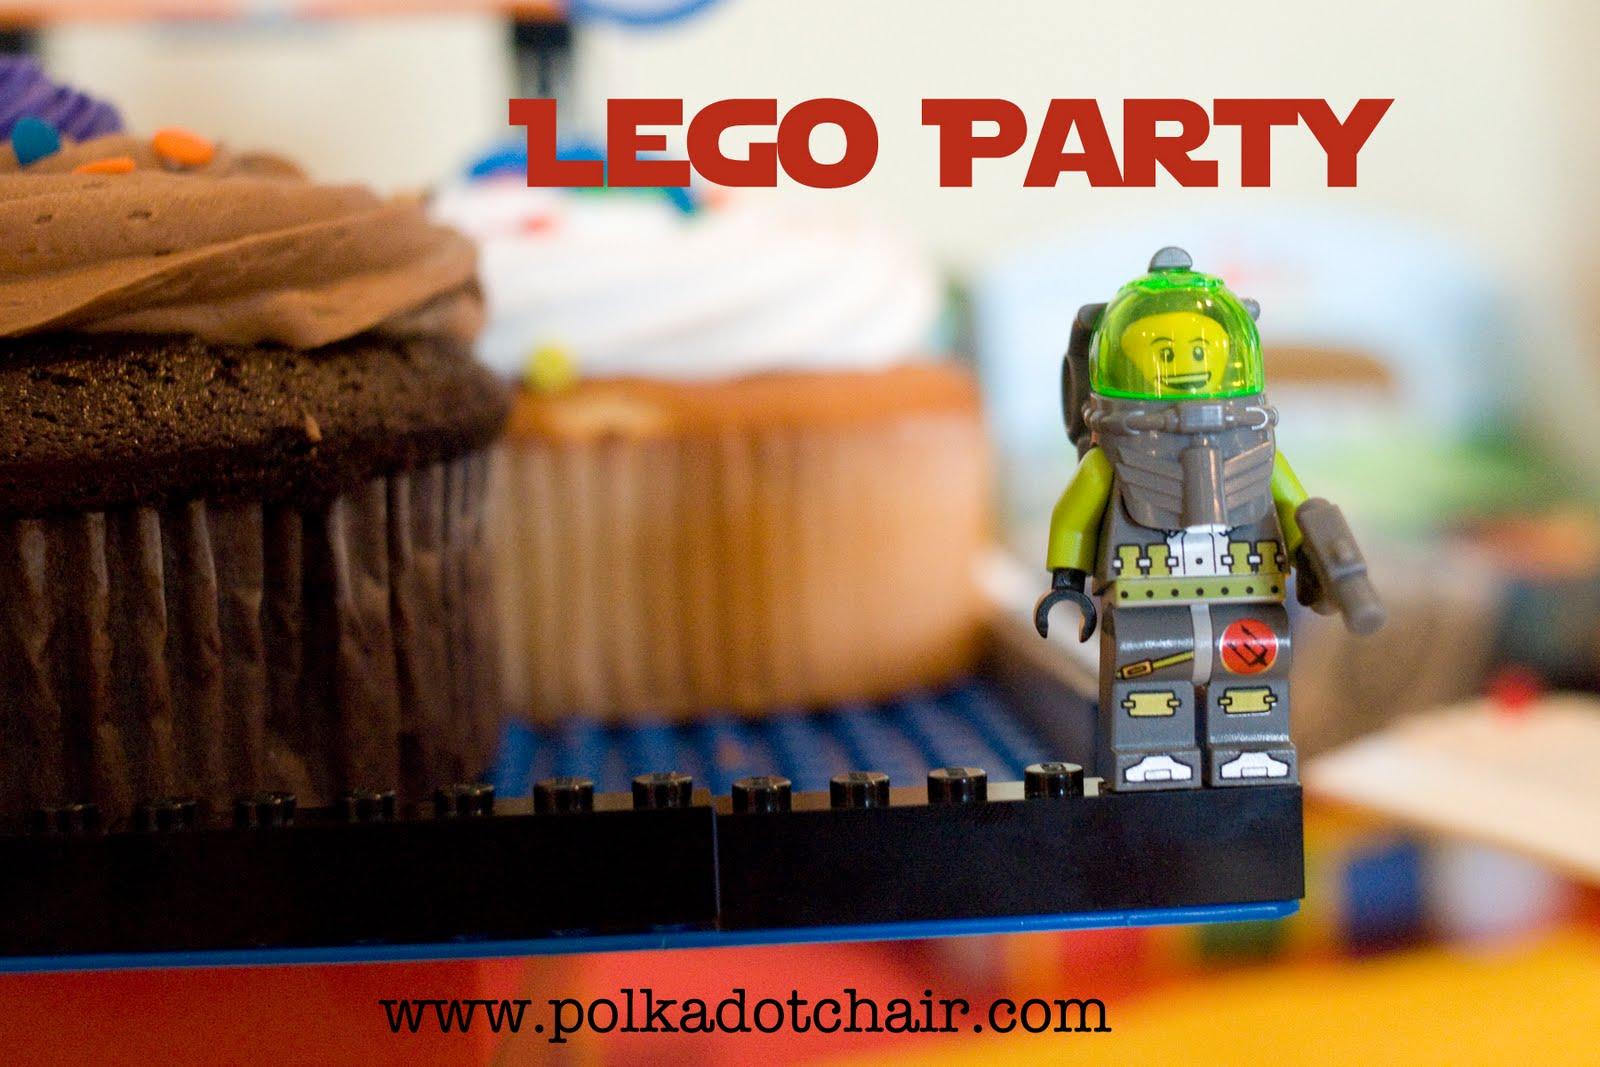 Lego Themed Cake Design